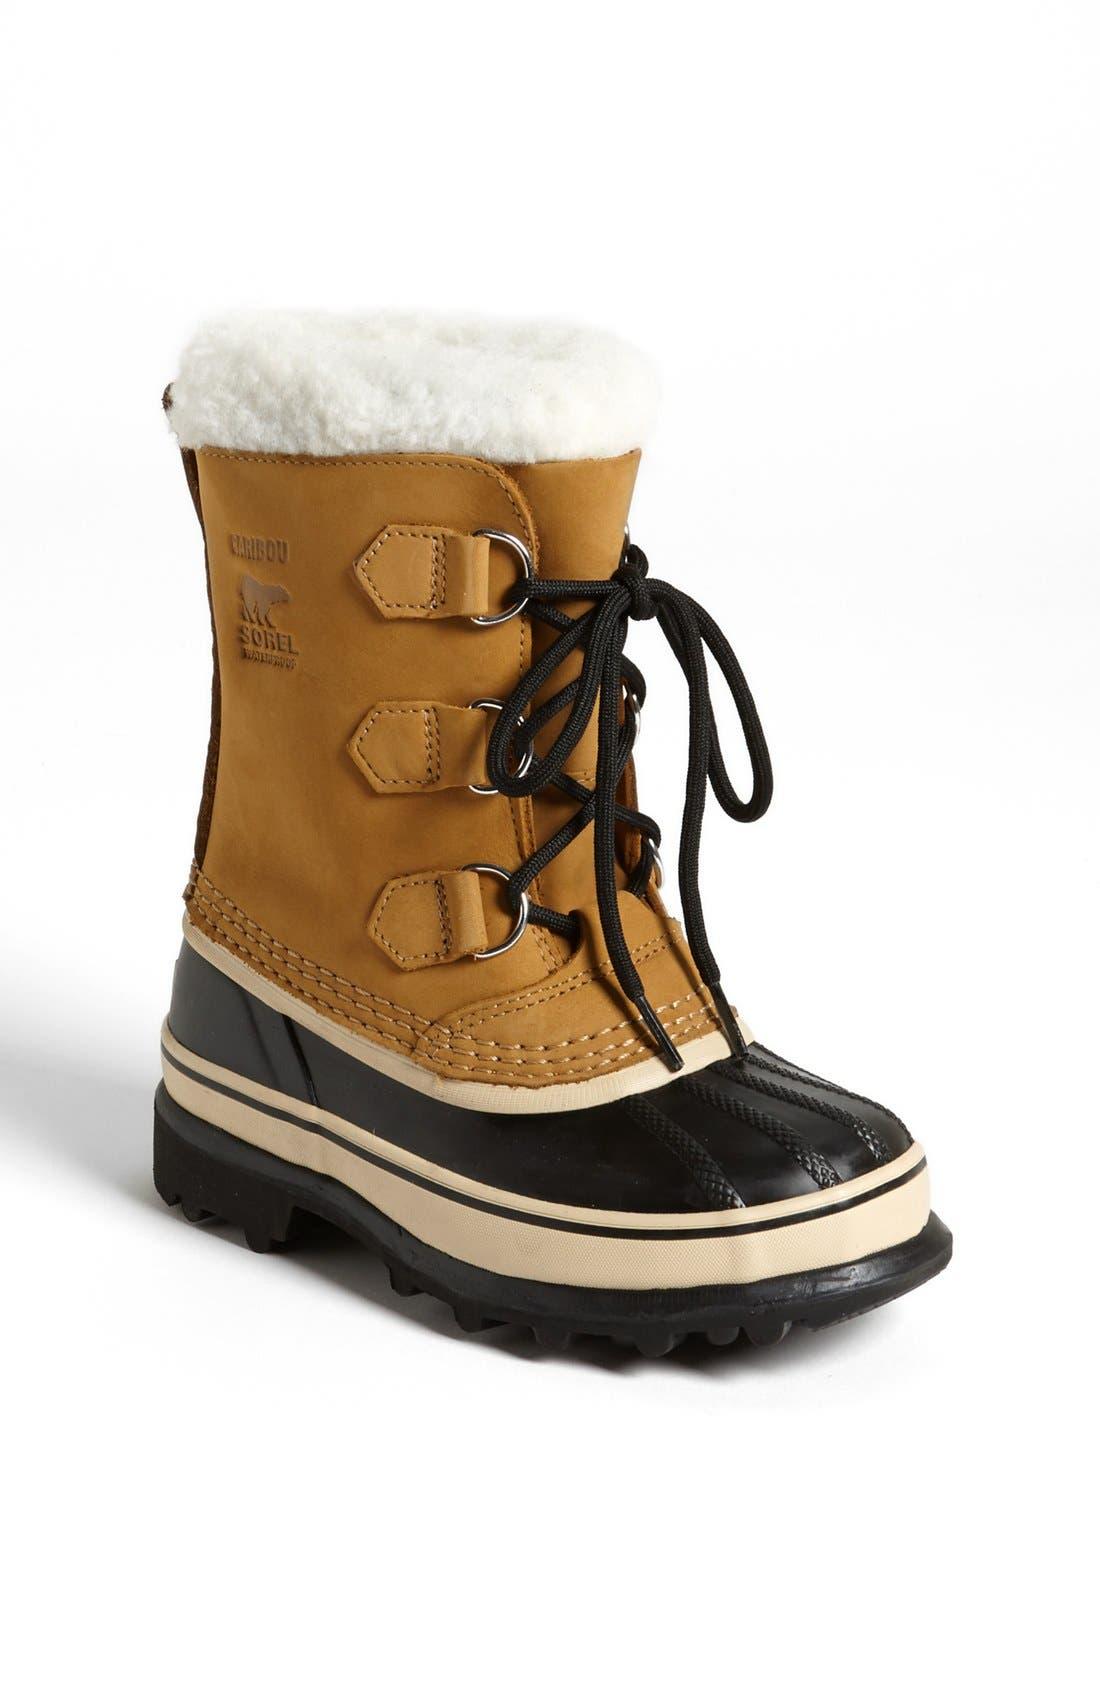 Caribou Waterproof Boot,                             Main thumbnail 1, color,                             281